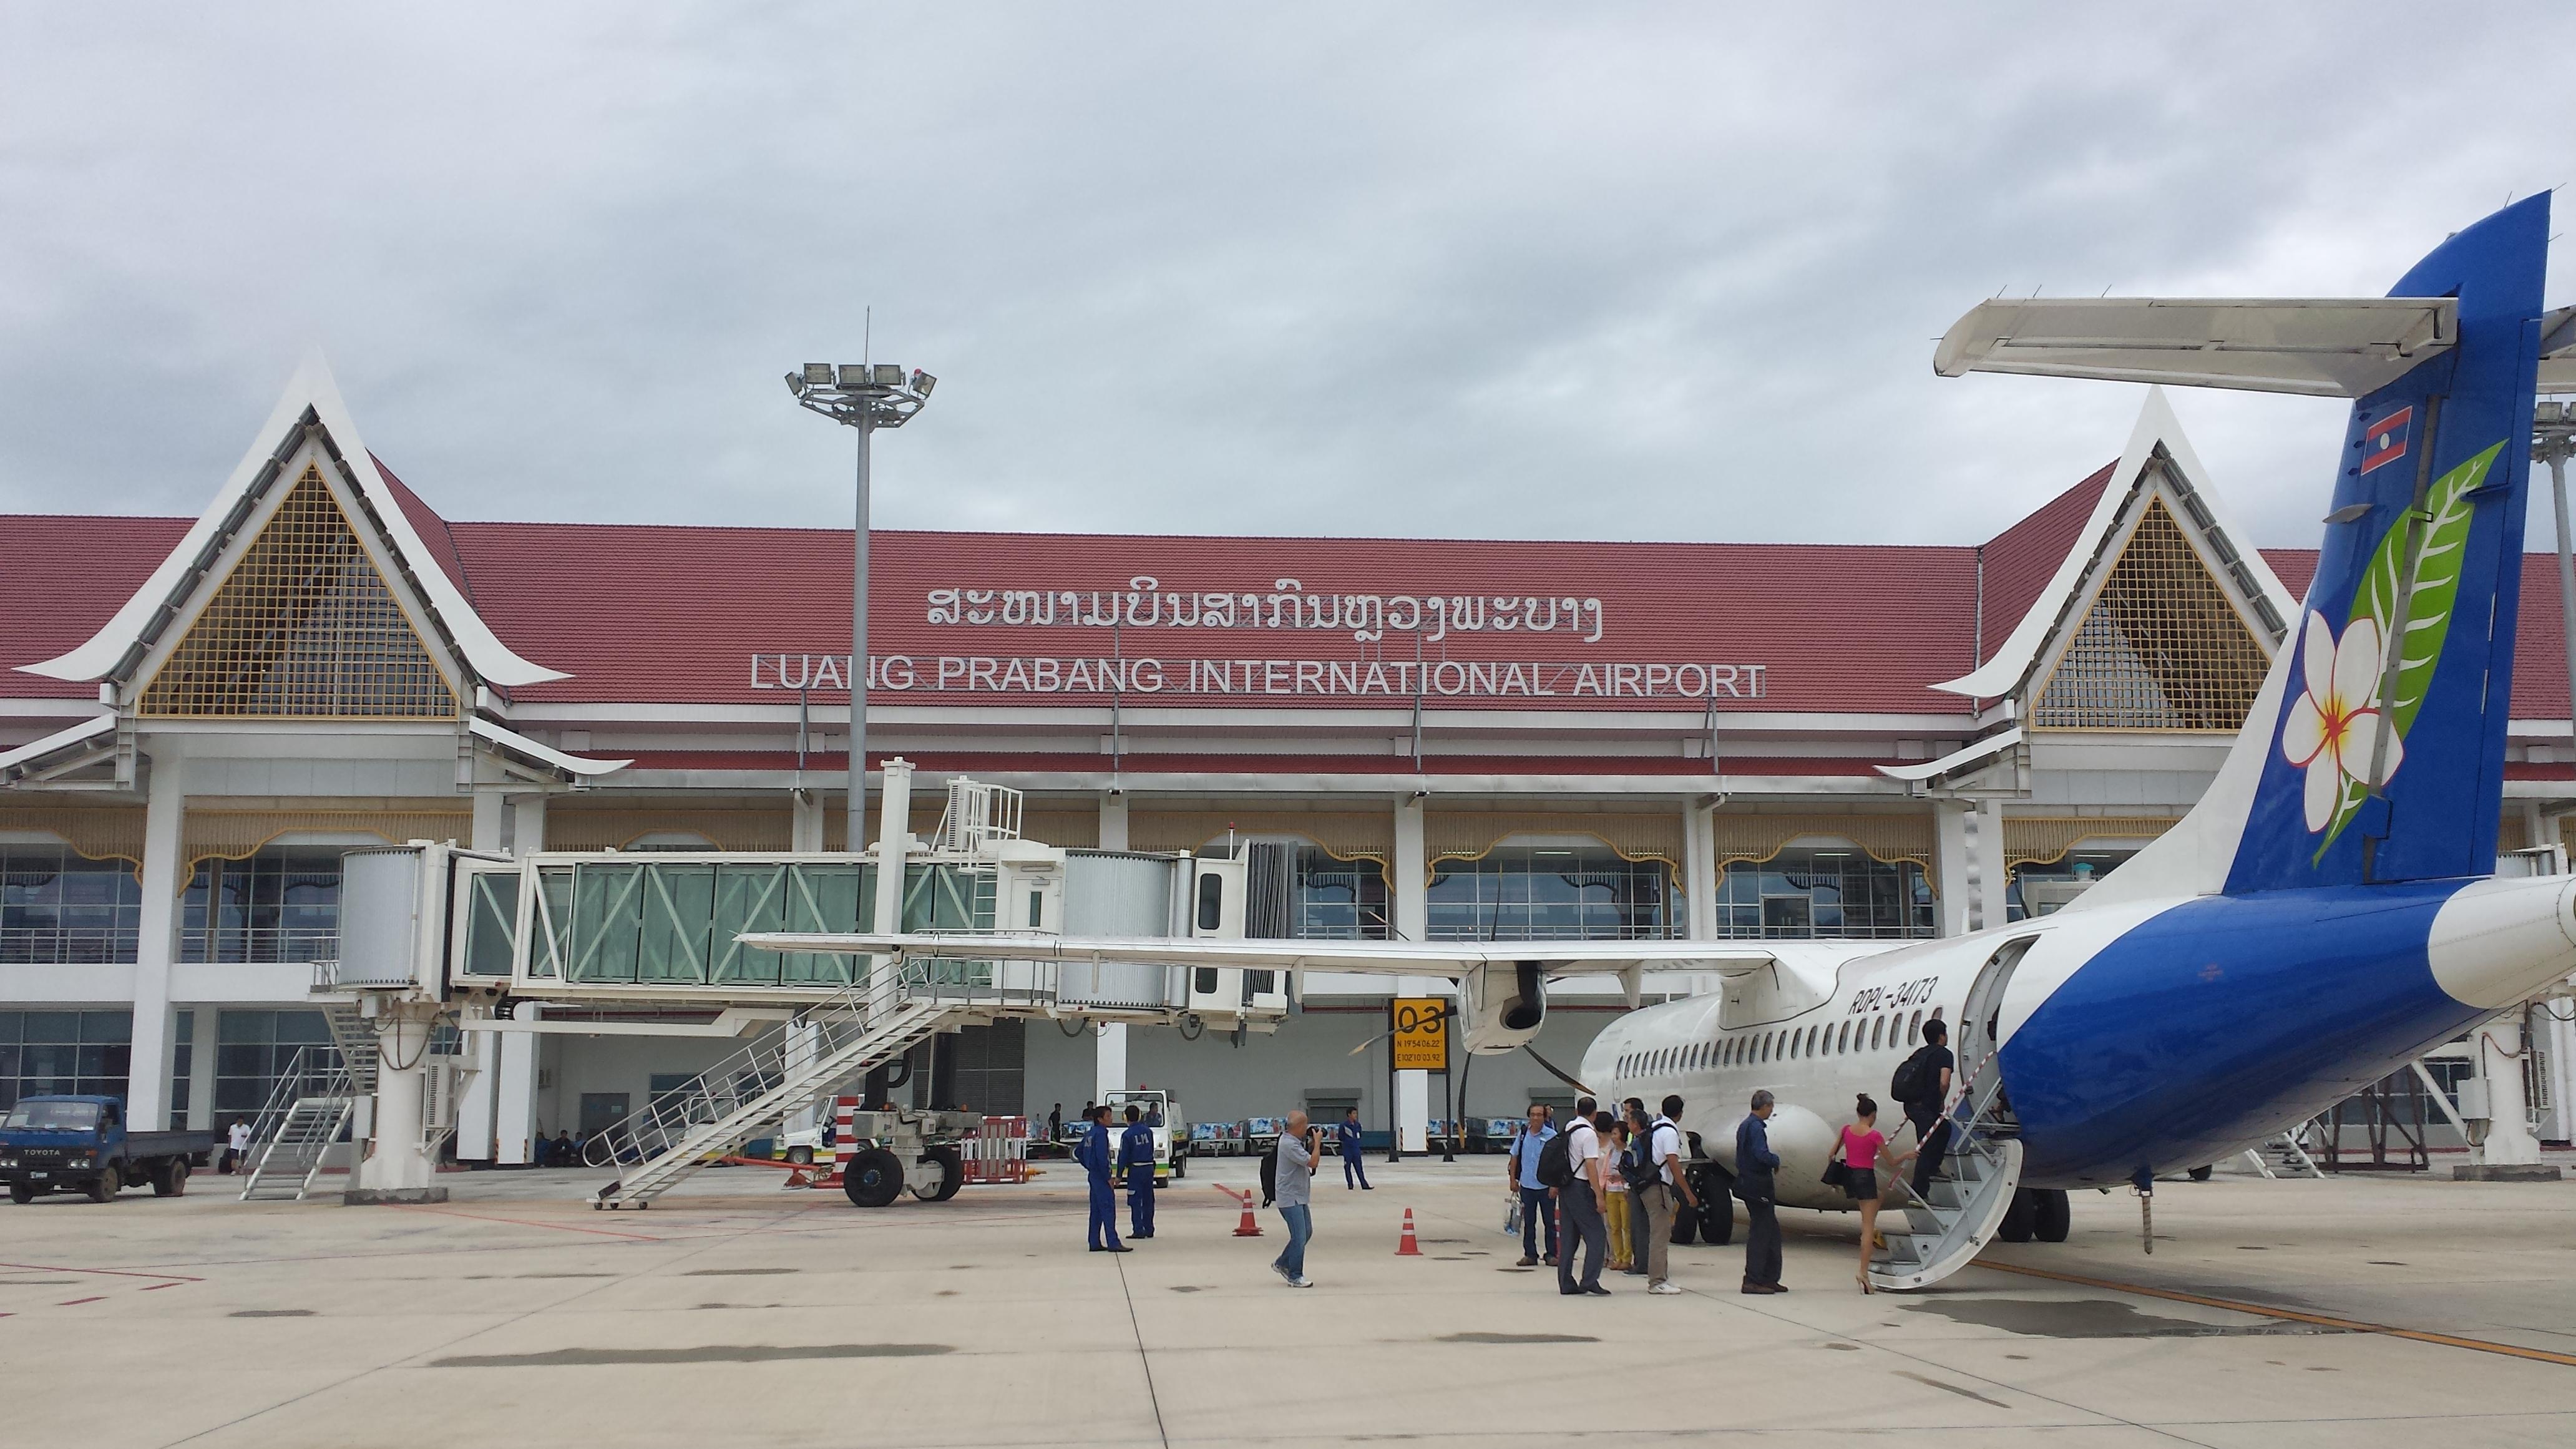 Laos international airport